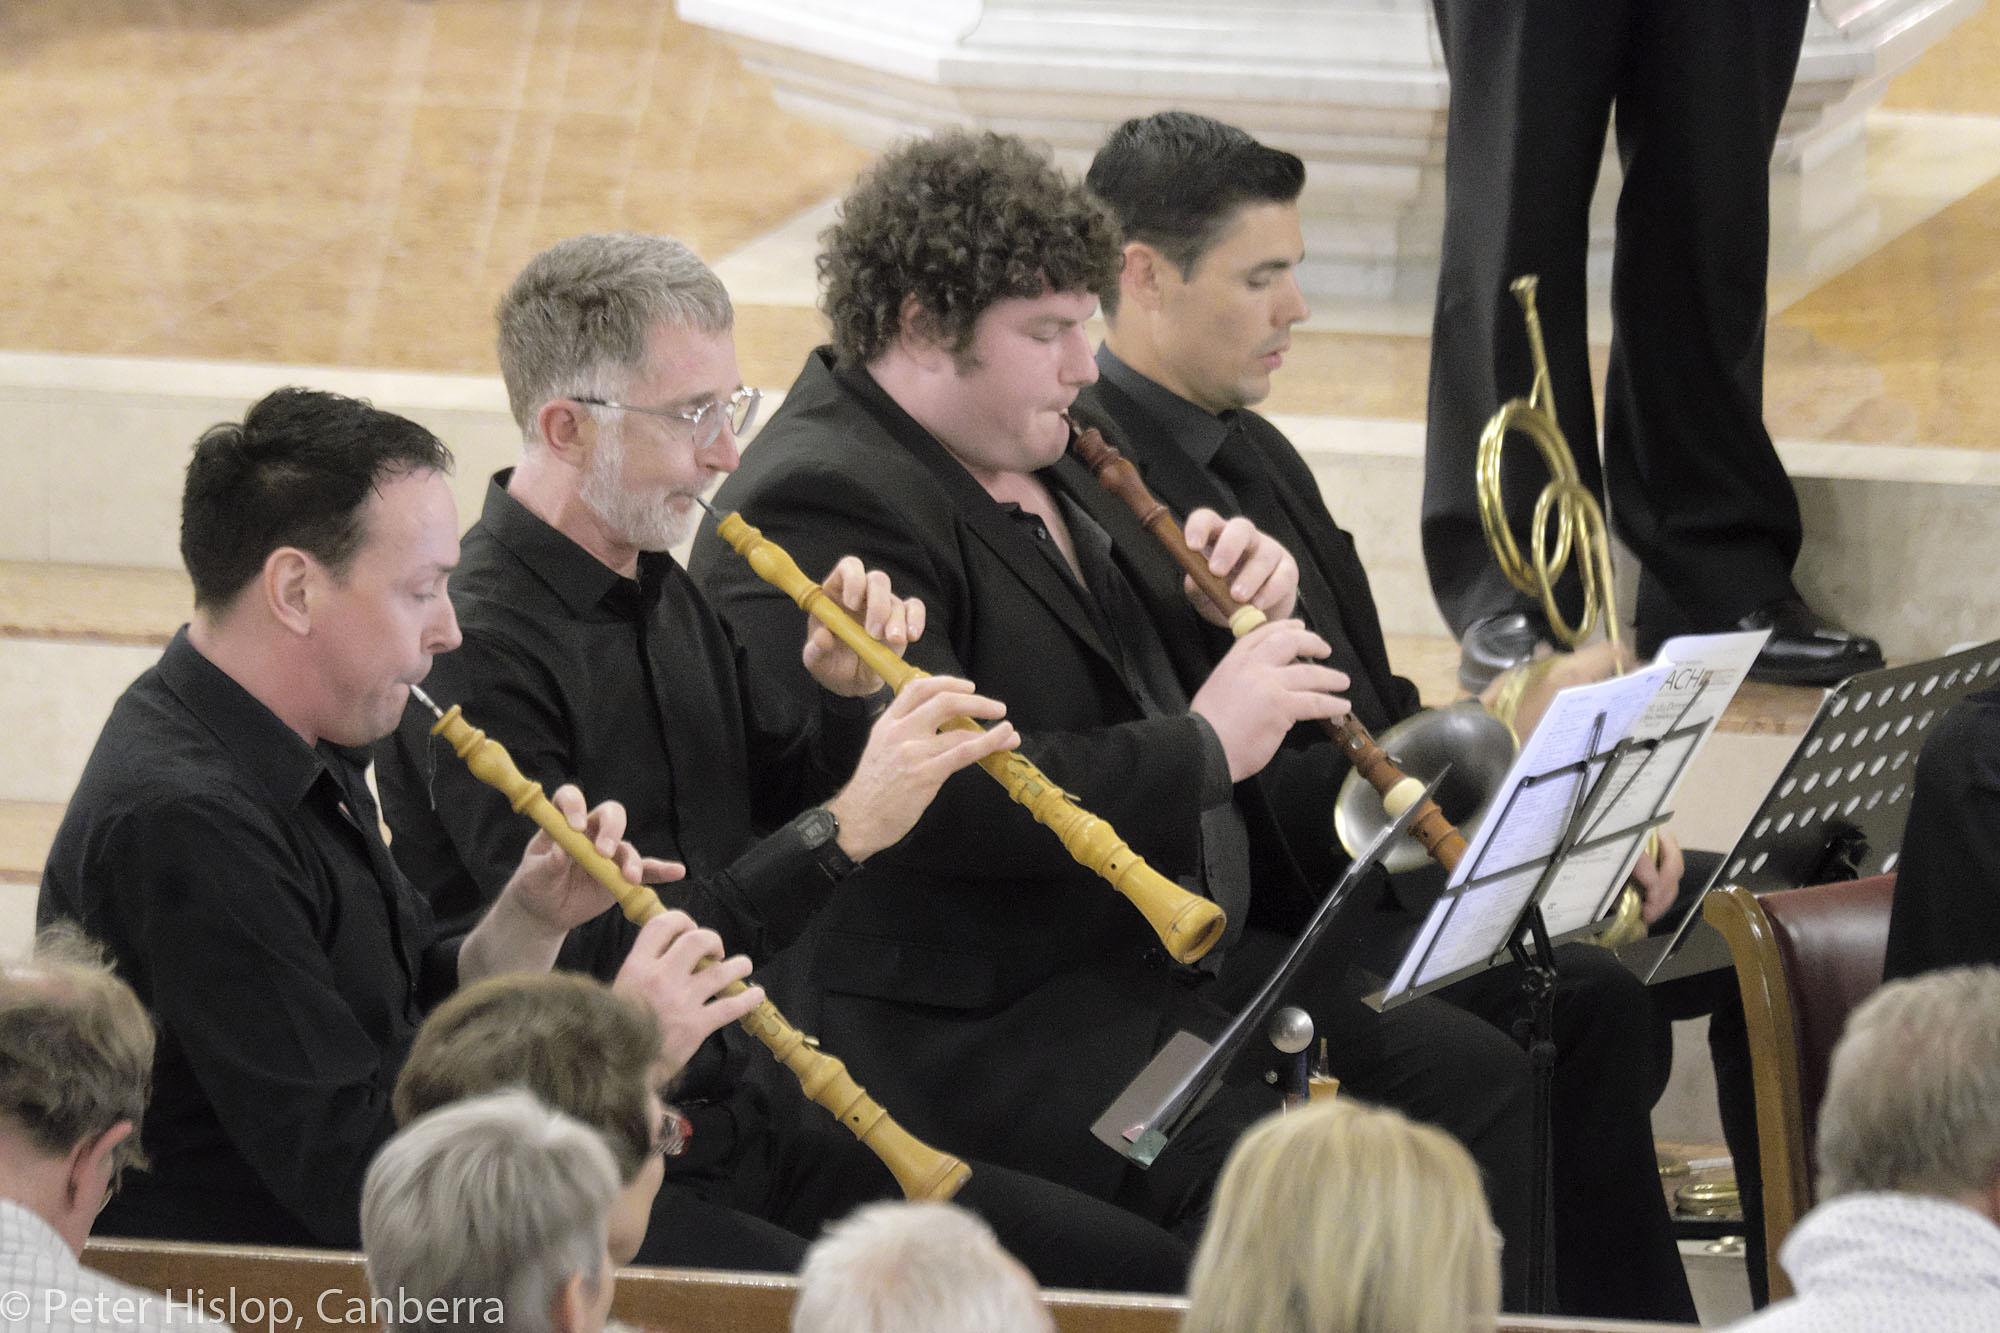 20181027c 001 Canberra Bach Ensemble - O